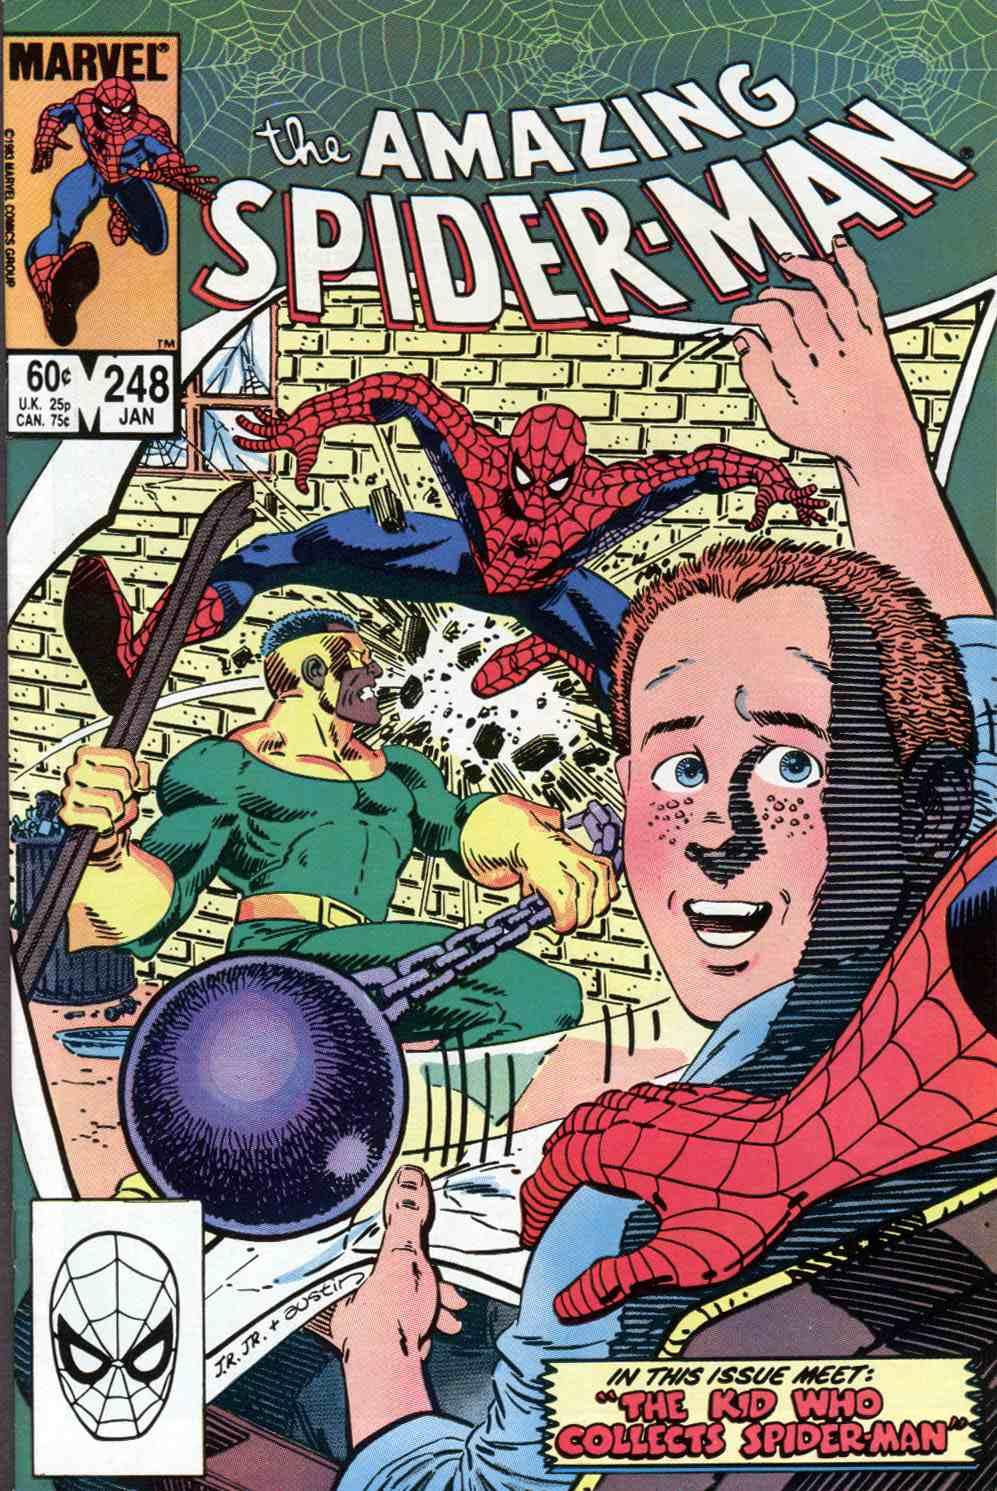 On a lu… Le garçon qui collectionnait Spider-man